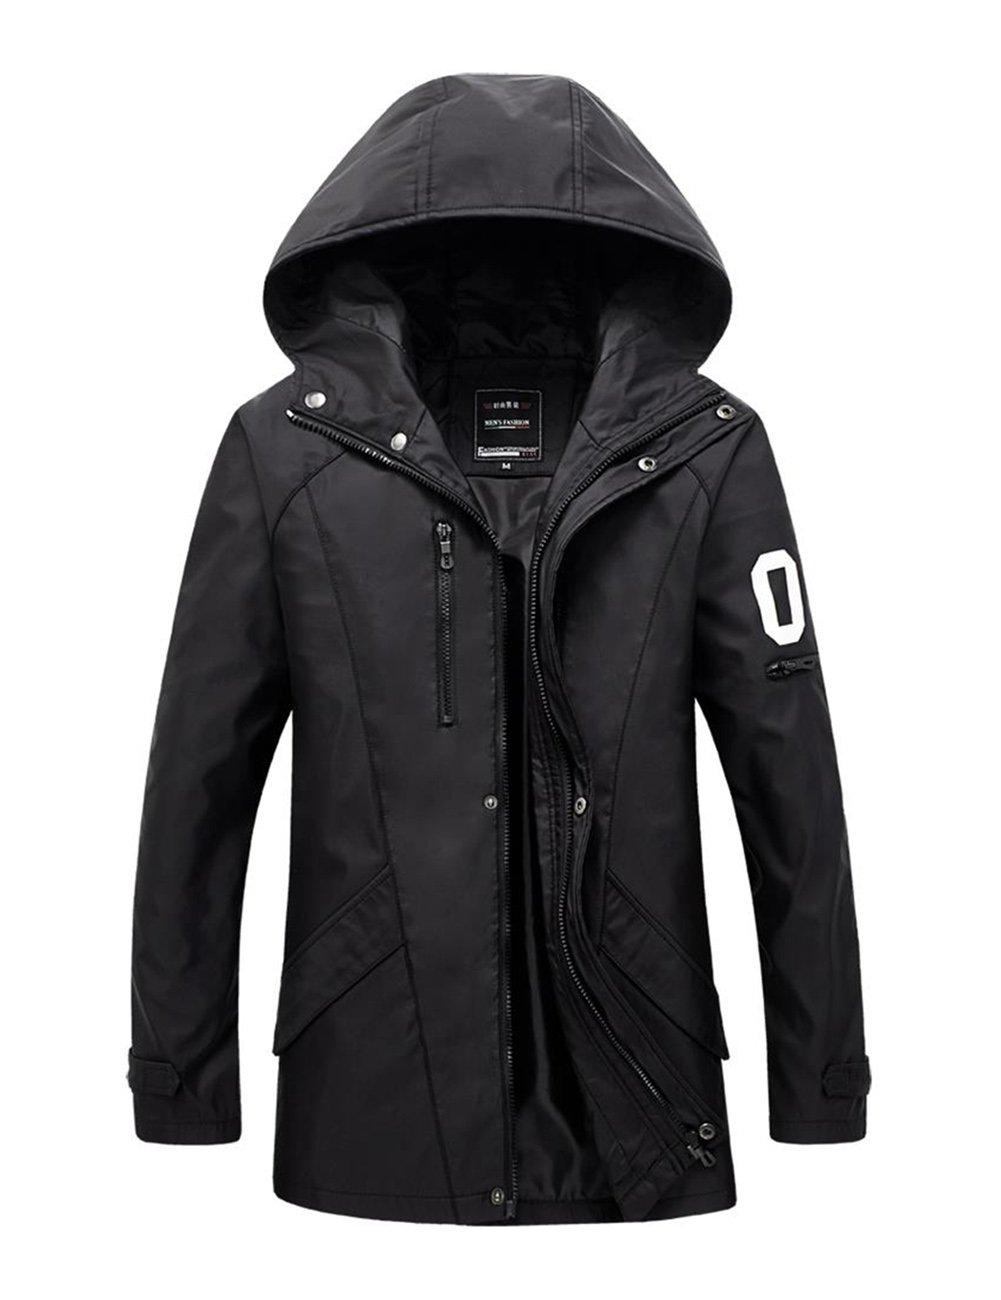 LanLan Men's Hooded Windbreaker Jackets British Style Zipper Closure Jacket Black 4XL